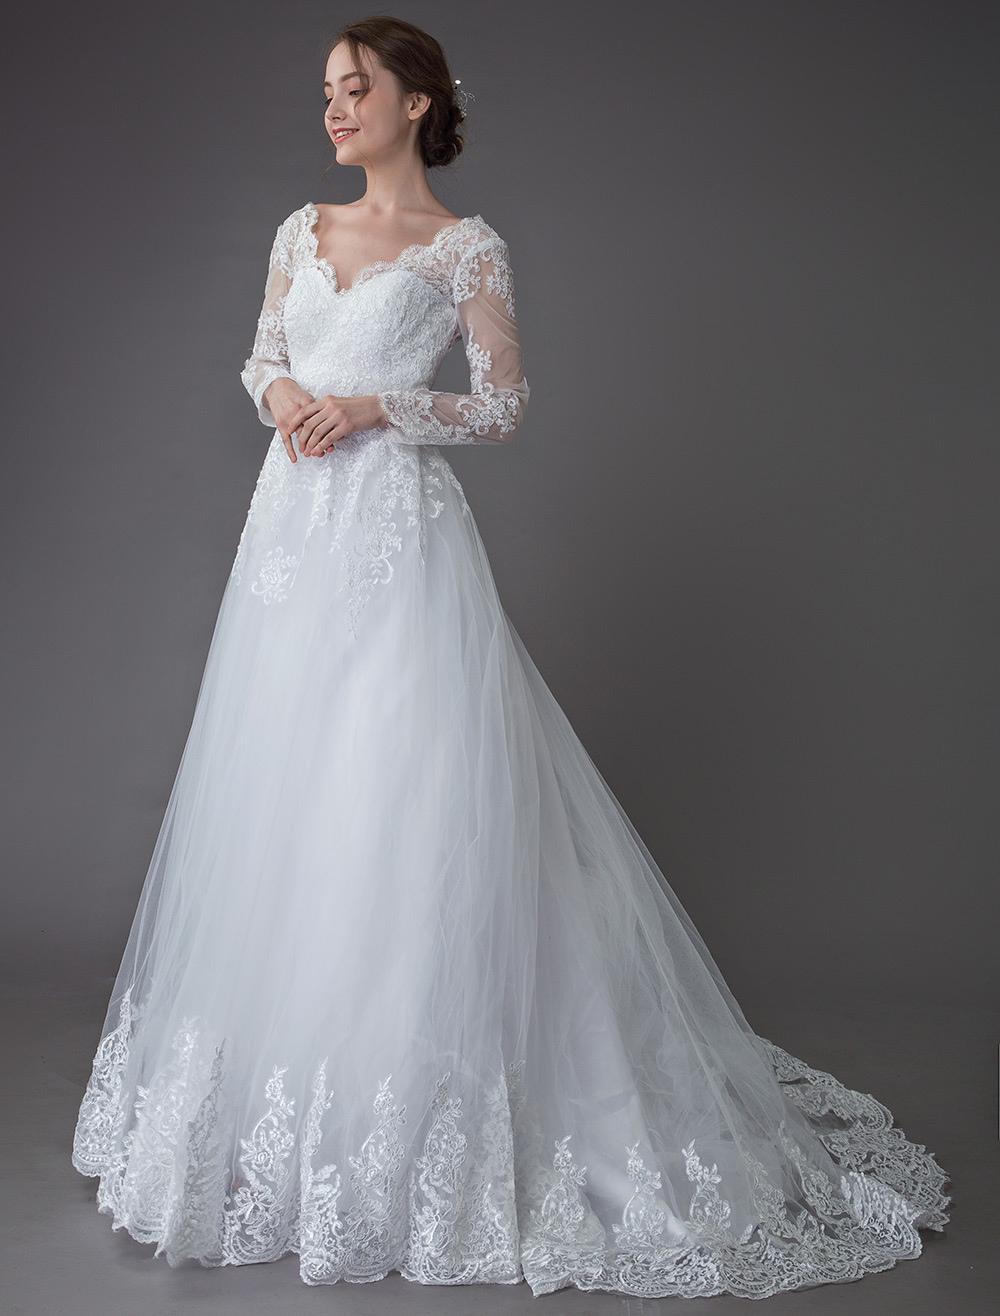 Lace Wedding Dresses Ball Gown V Neck Long Sleeve Backless Princess Bridal Dress Milanoo Com,Simple Long White Wedding Dress